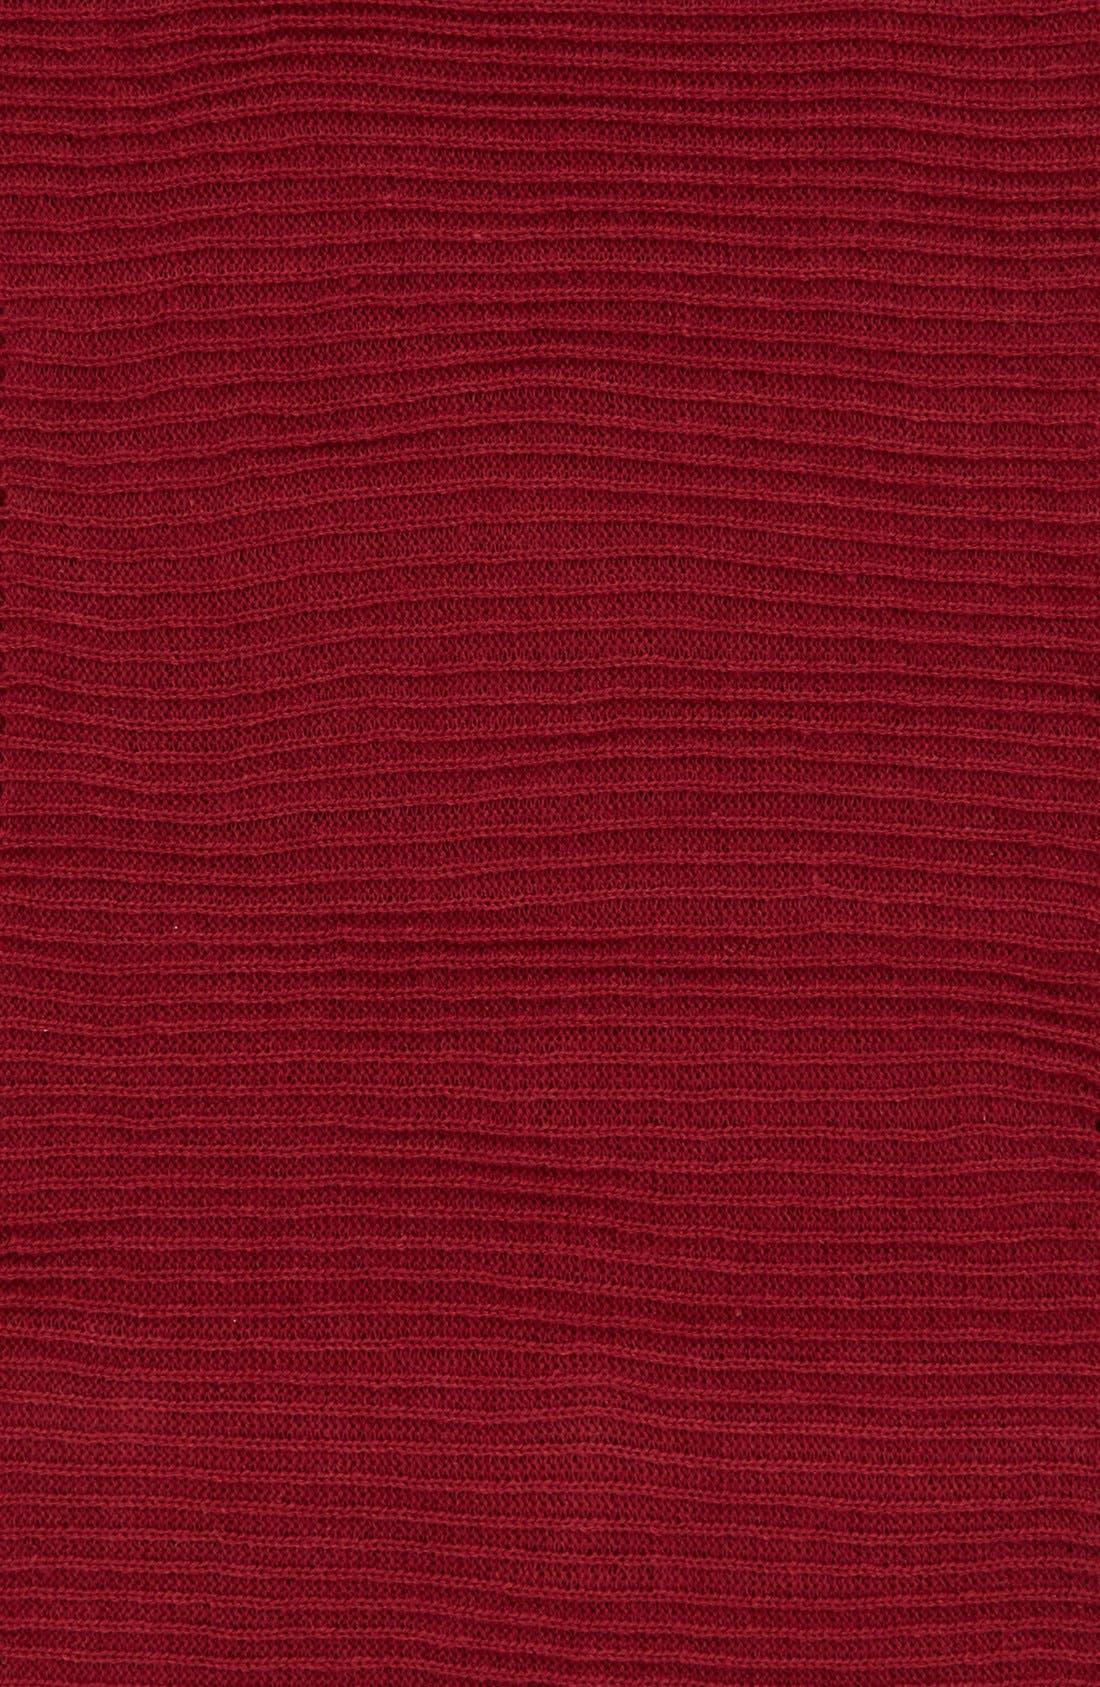 Rib Knit Fringe Infinity Scarf,                             Alternate thumbnail 12, color,